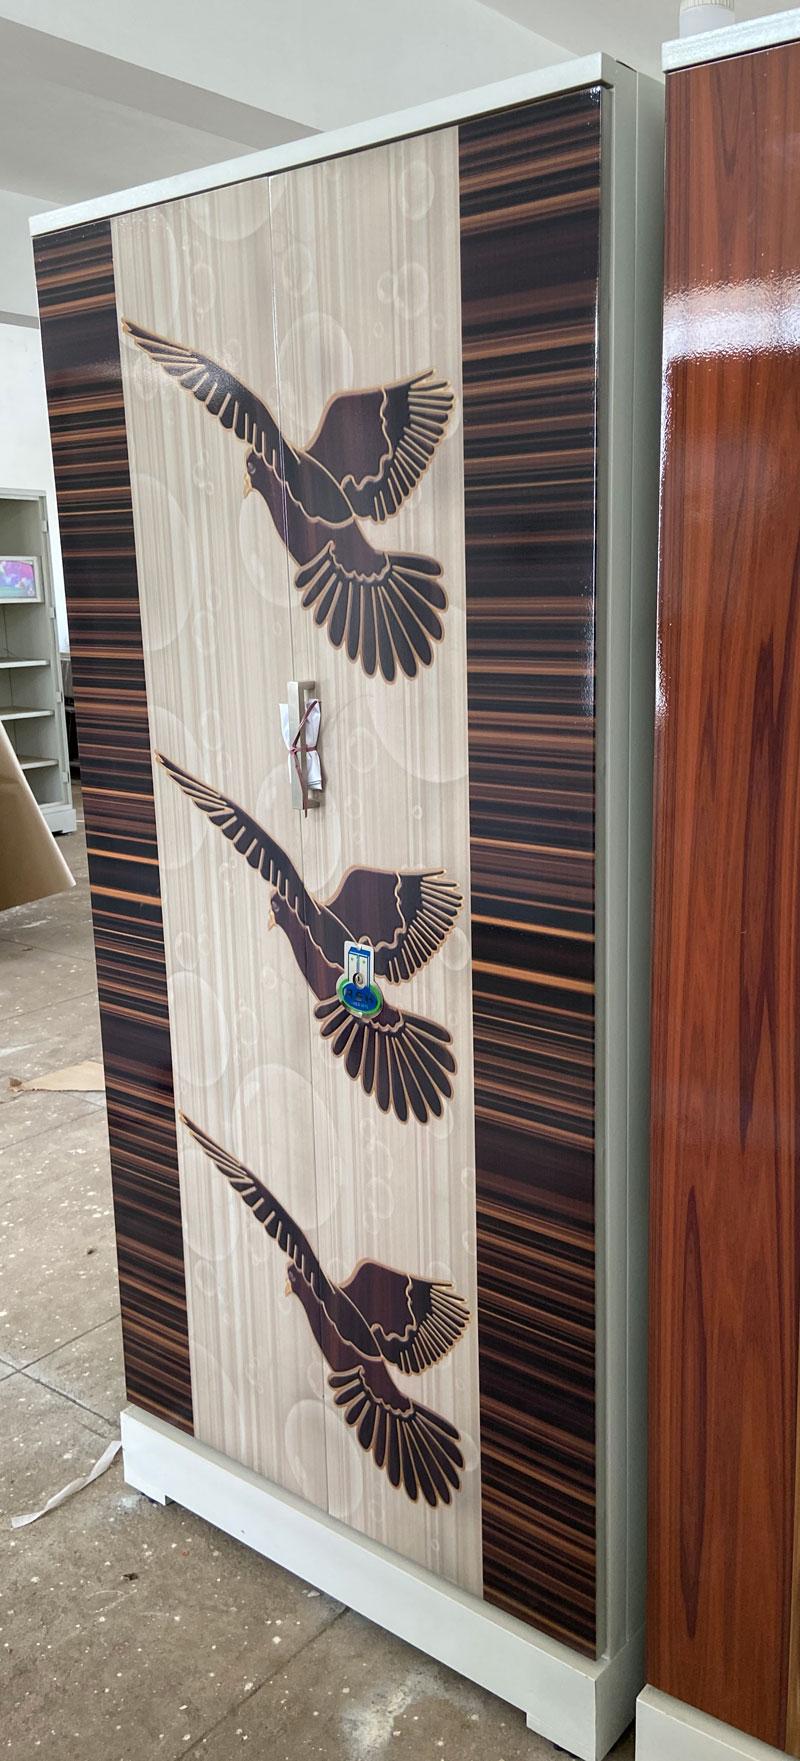 digital uv printed steel bero cupboard 3 pigeons dove walnut wooden stripes